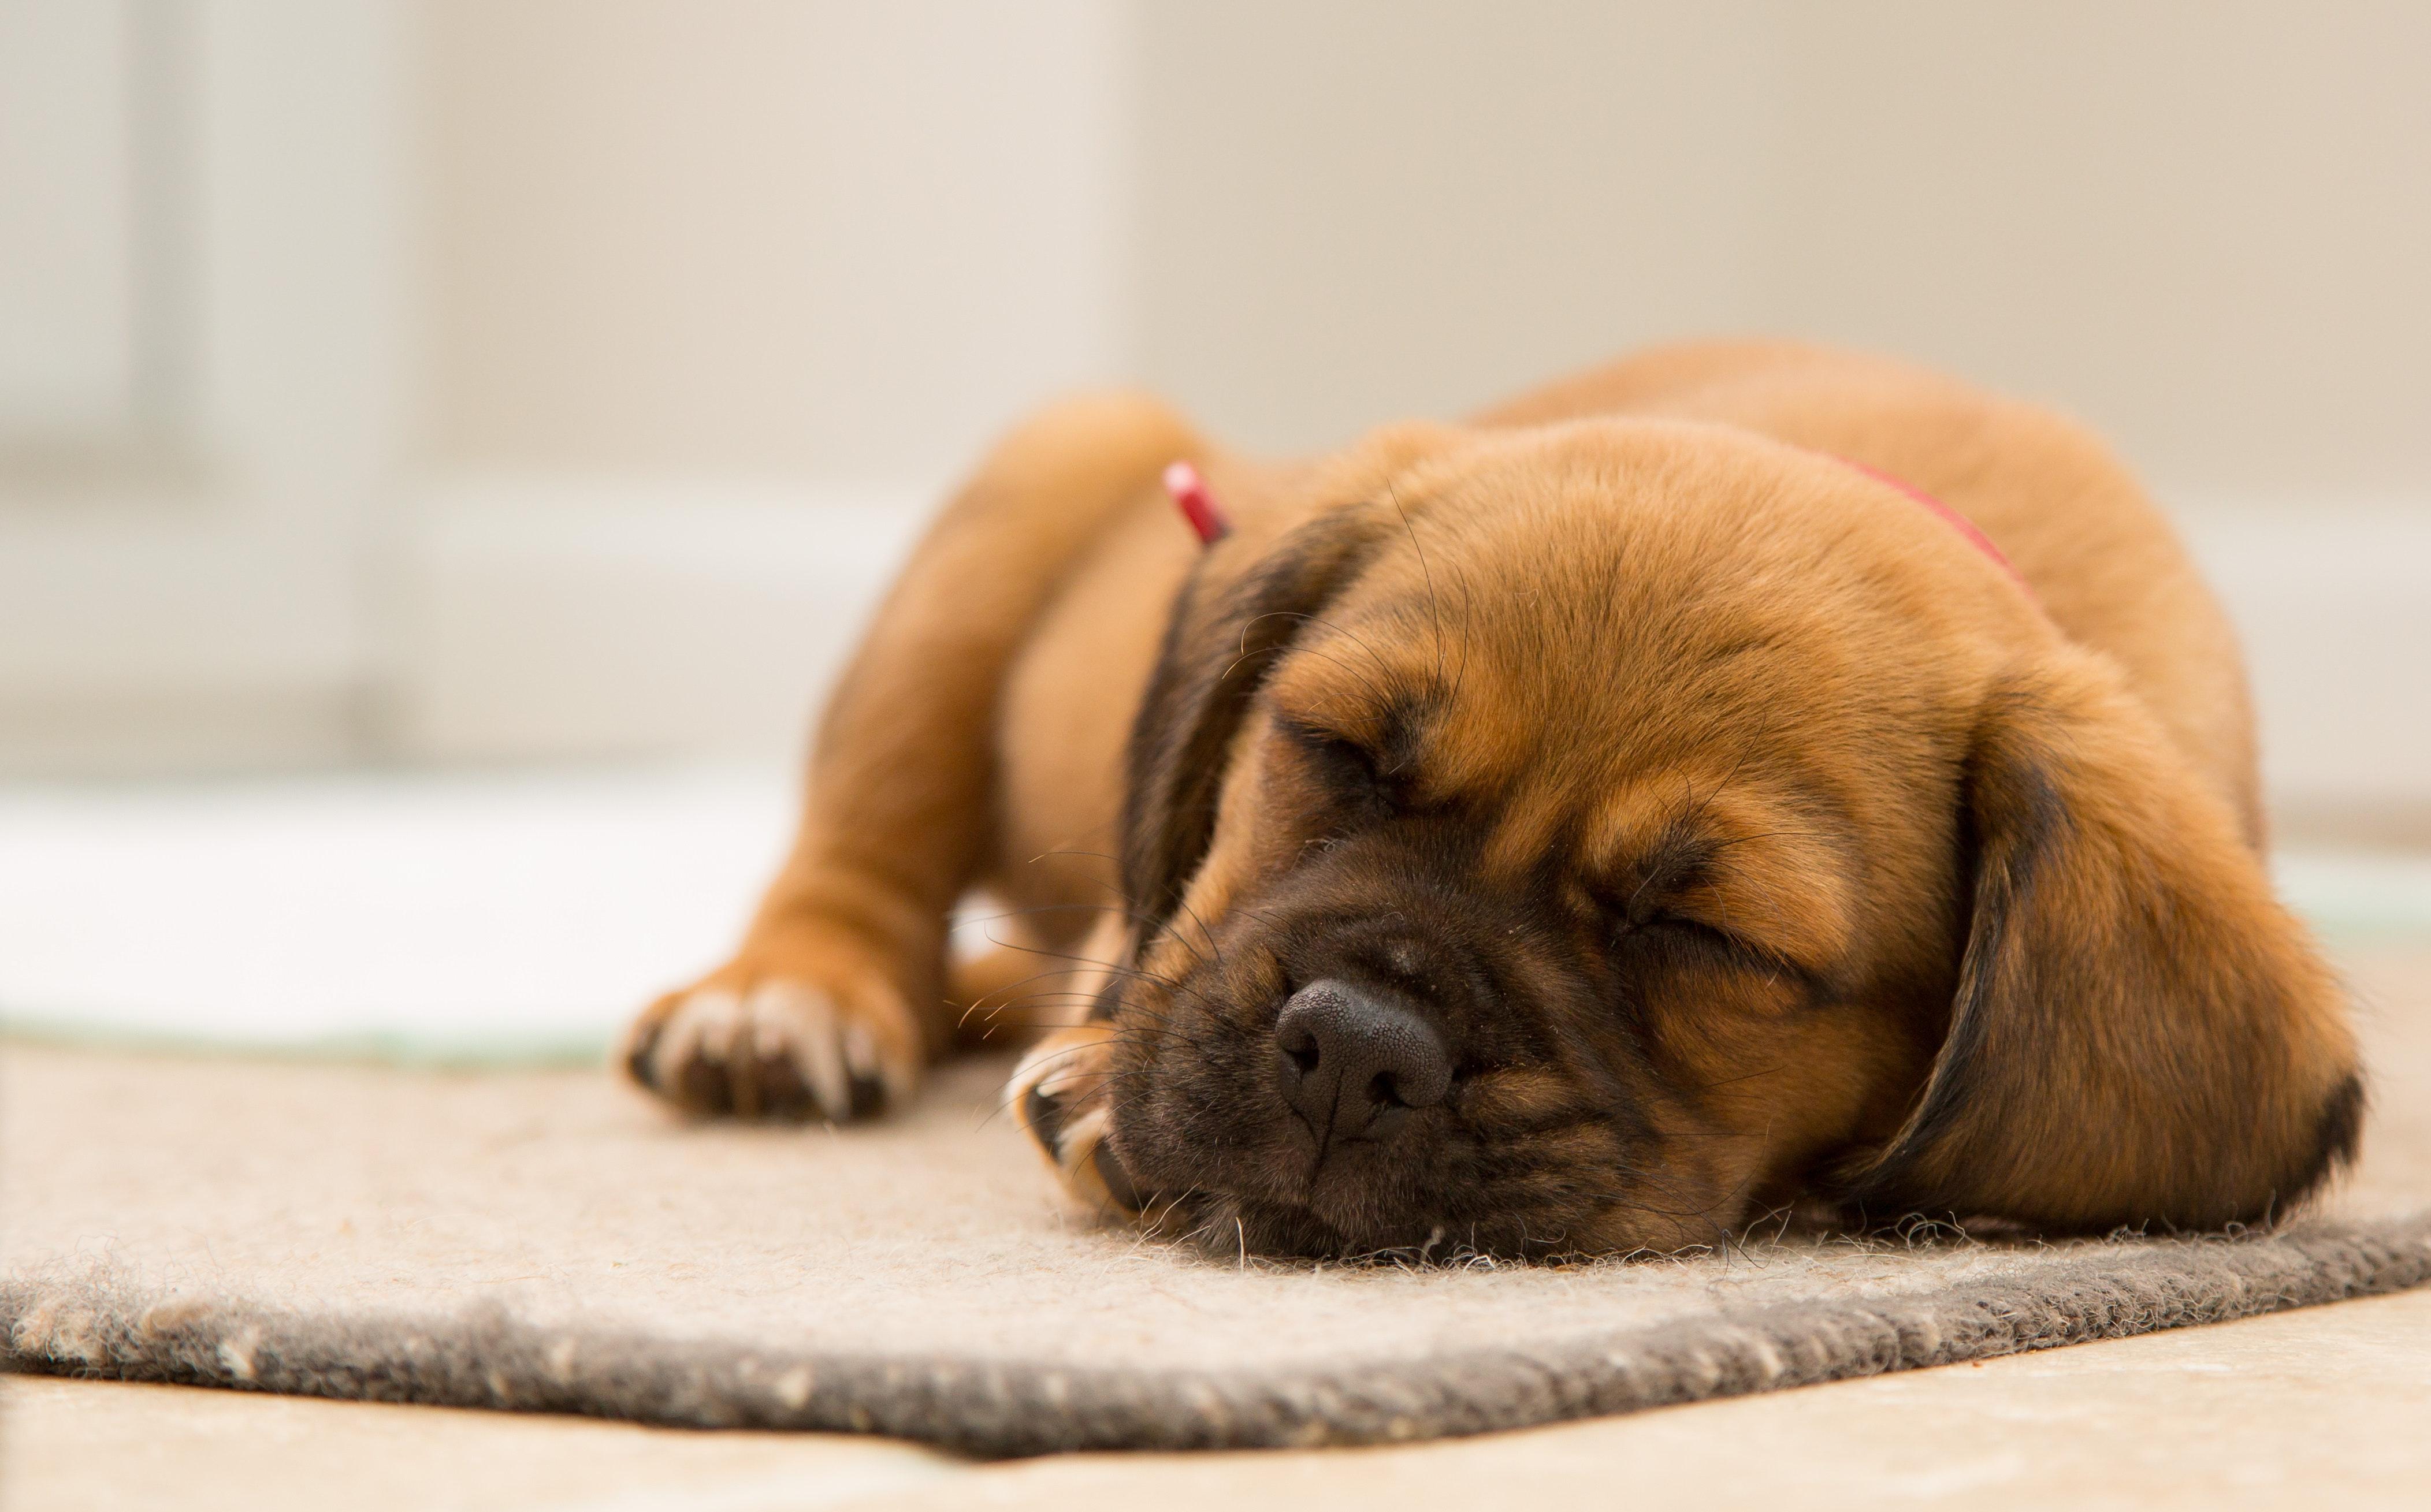 puppy-dog-sleeping